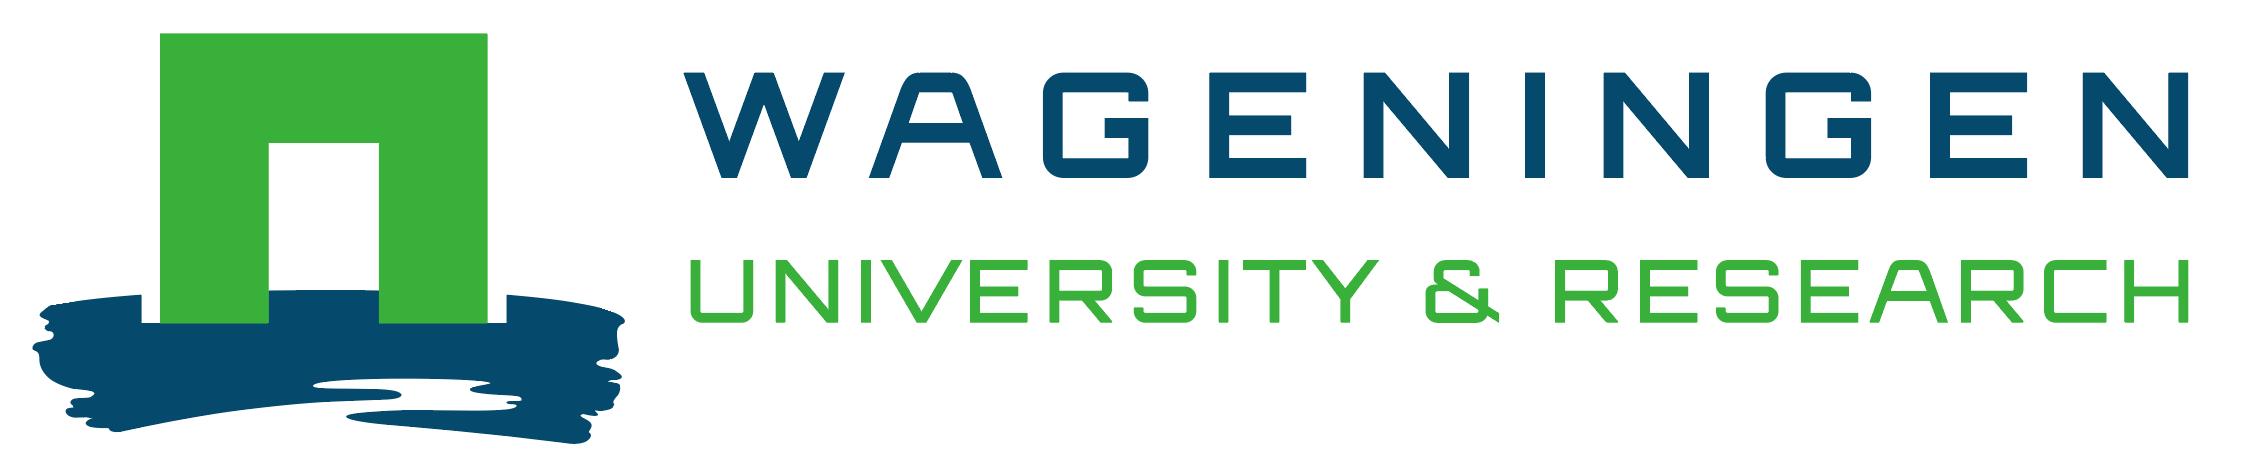 Wageningen logo.png